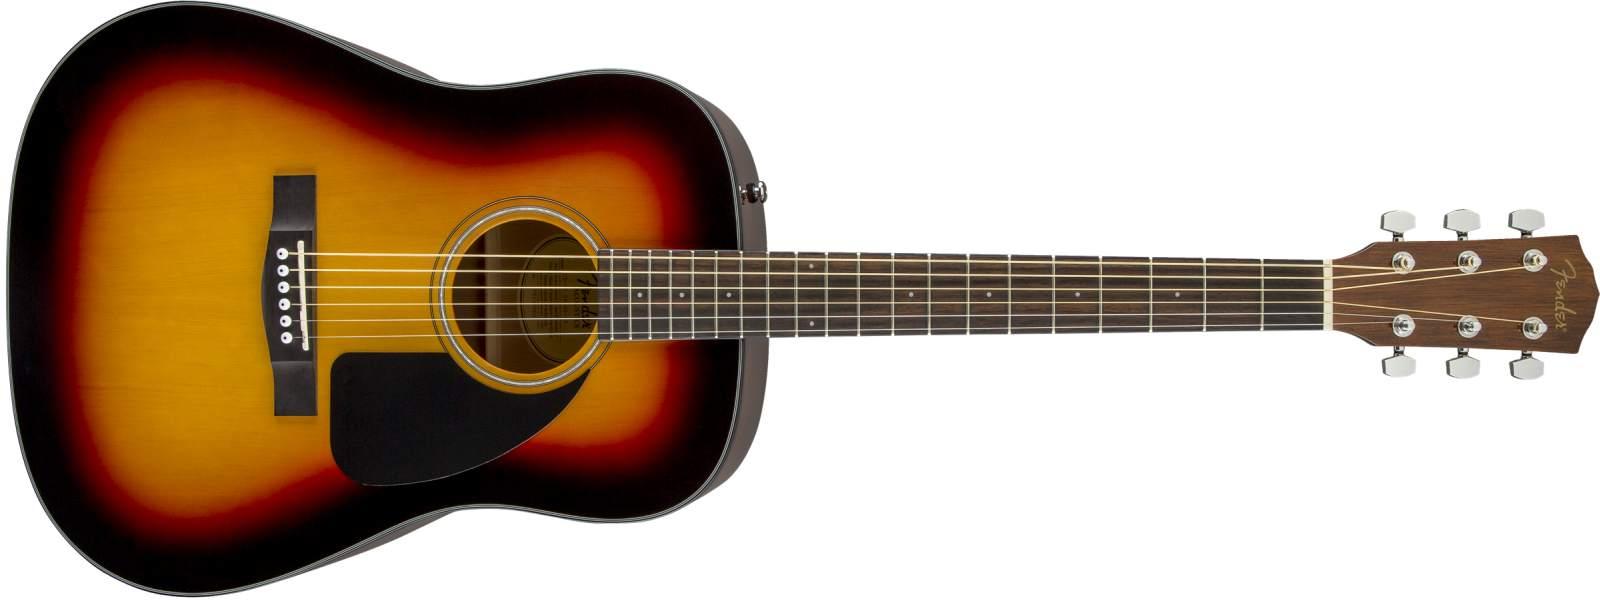 Fender CD-60 V3 DS SB Dreadnought